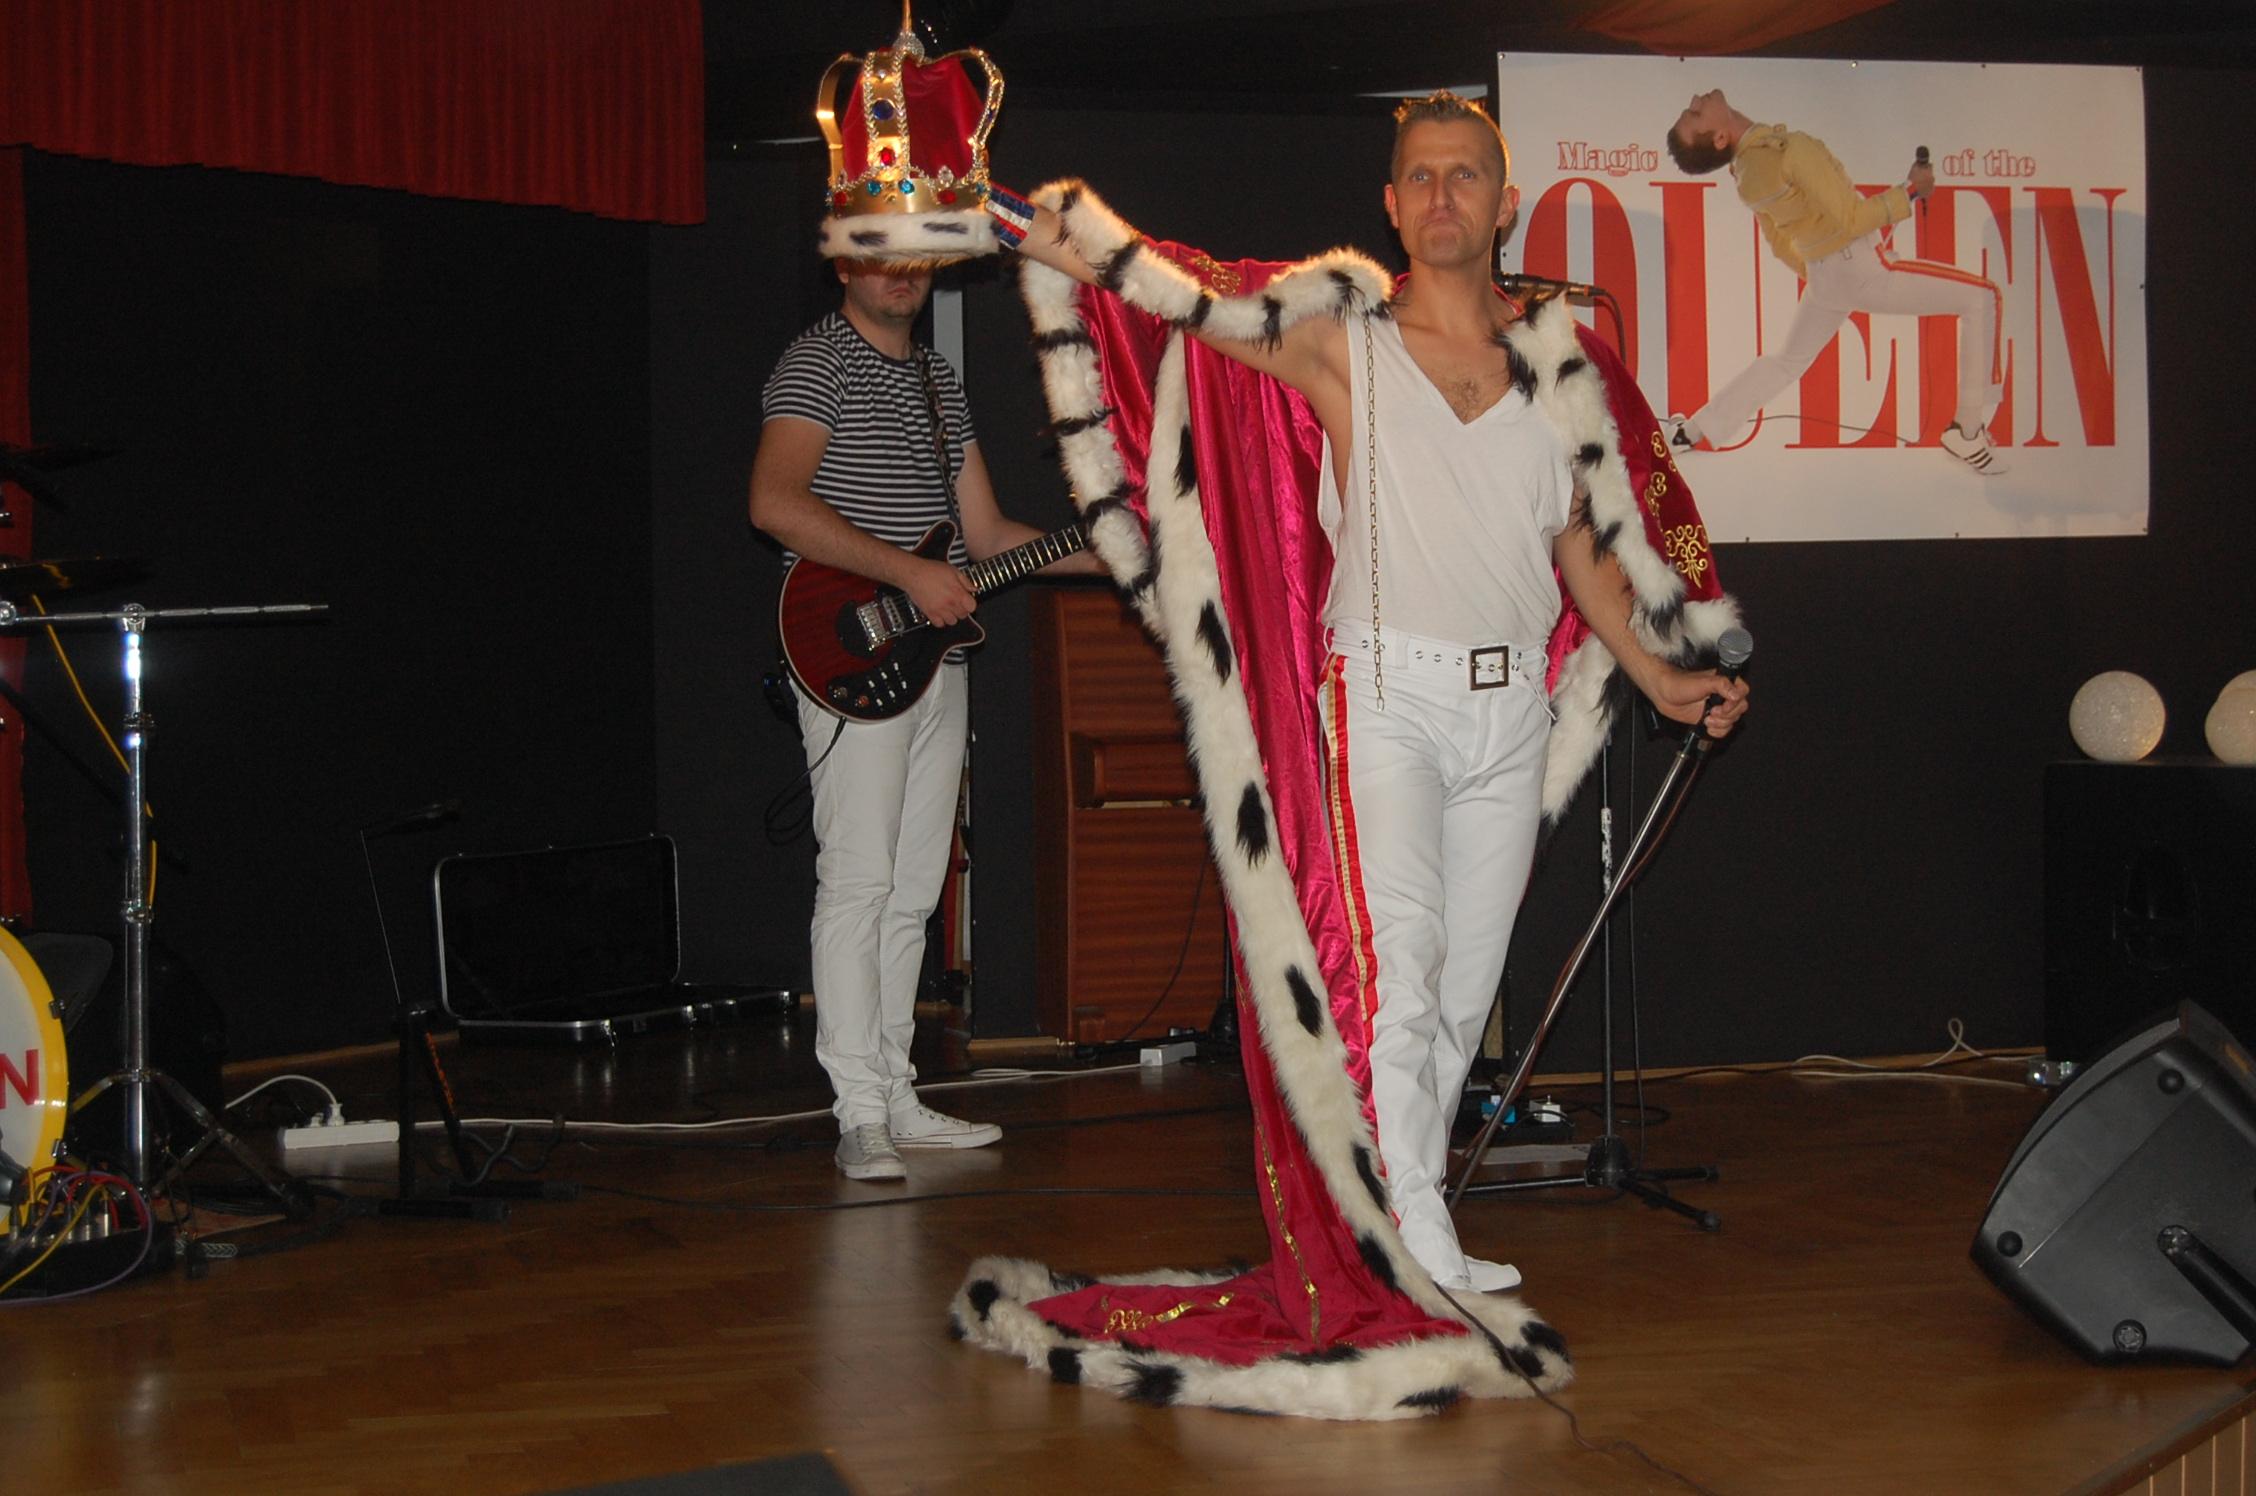 Koncert MAGIC OF THE QUEEN za nami!